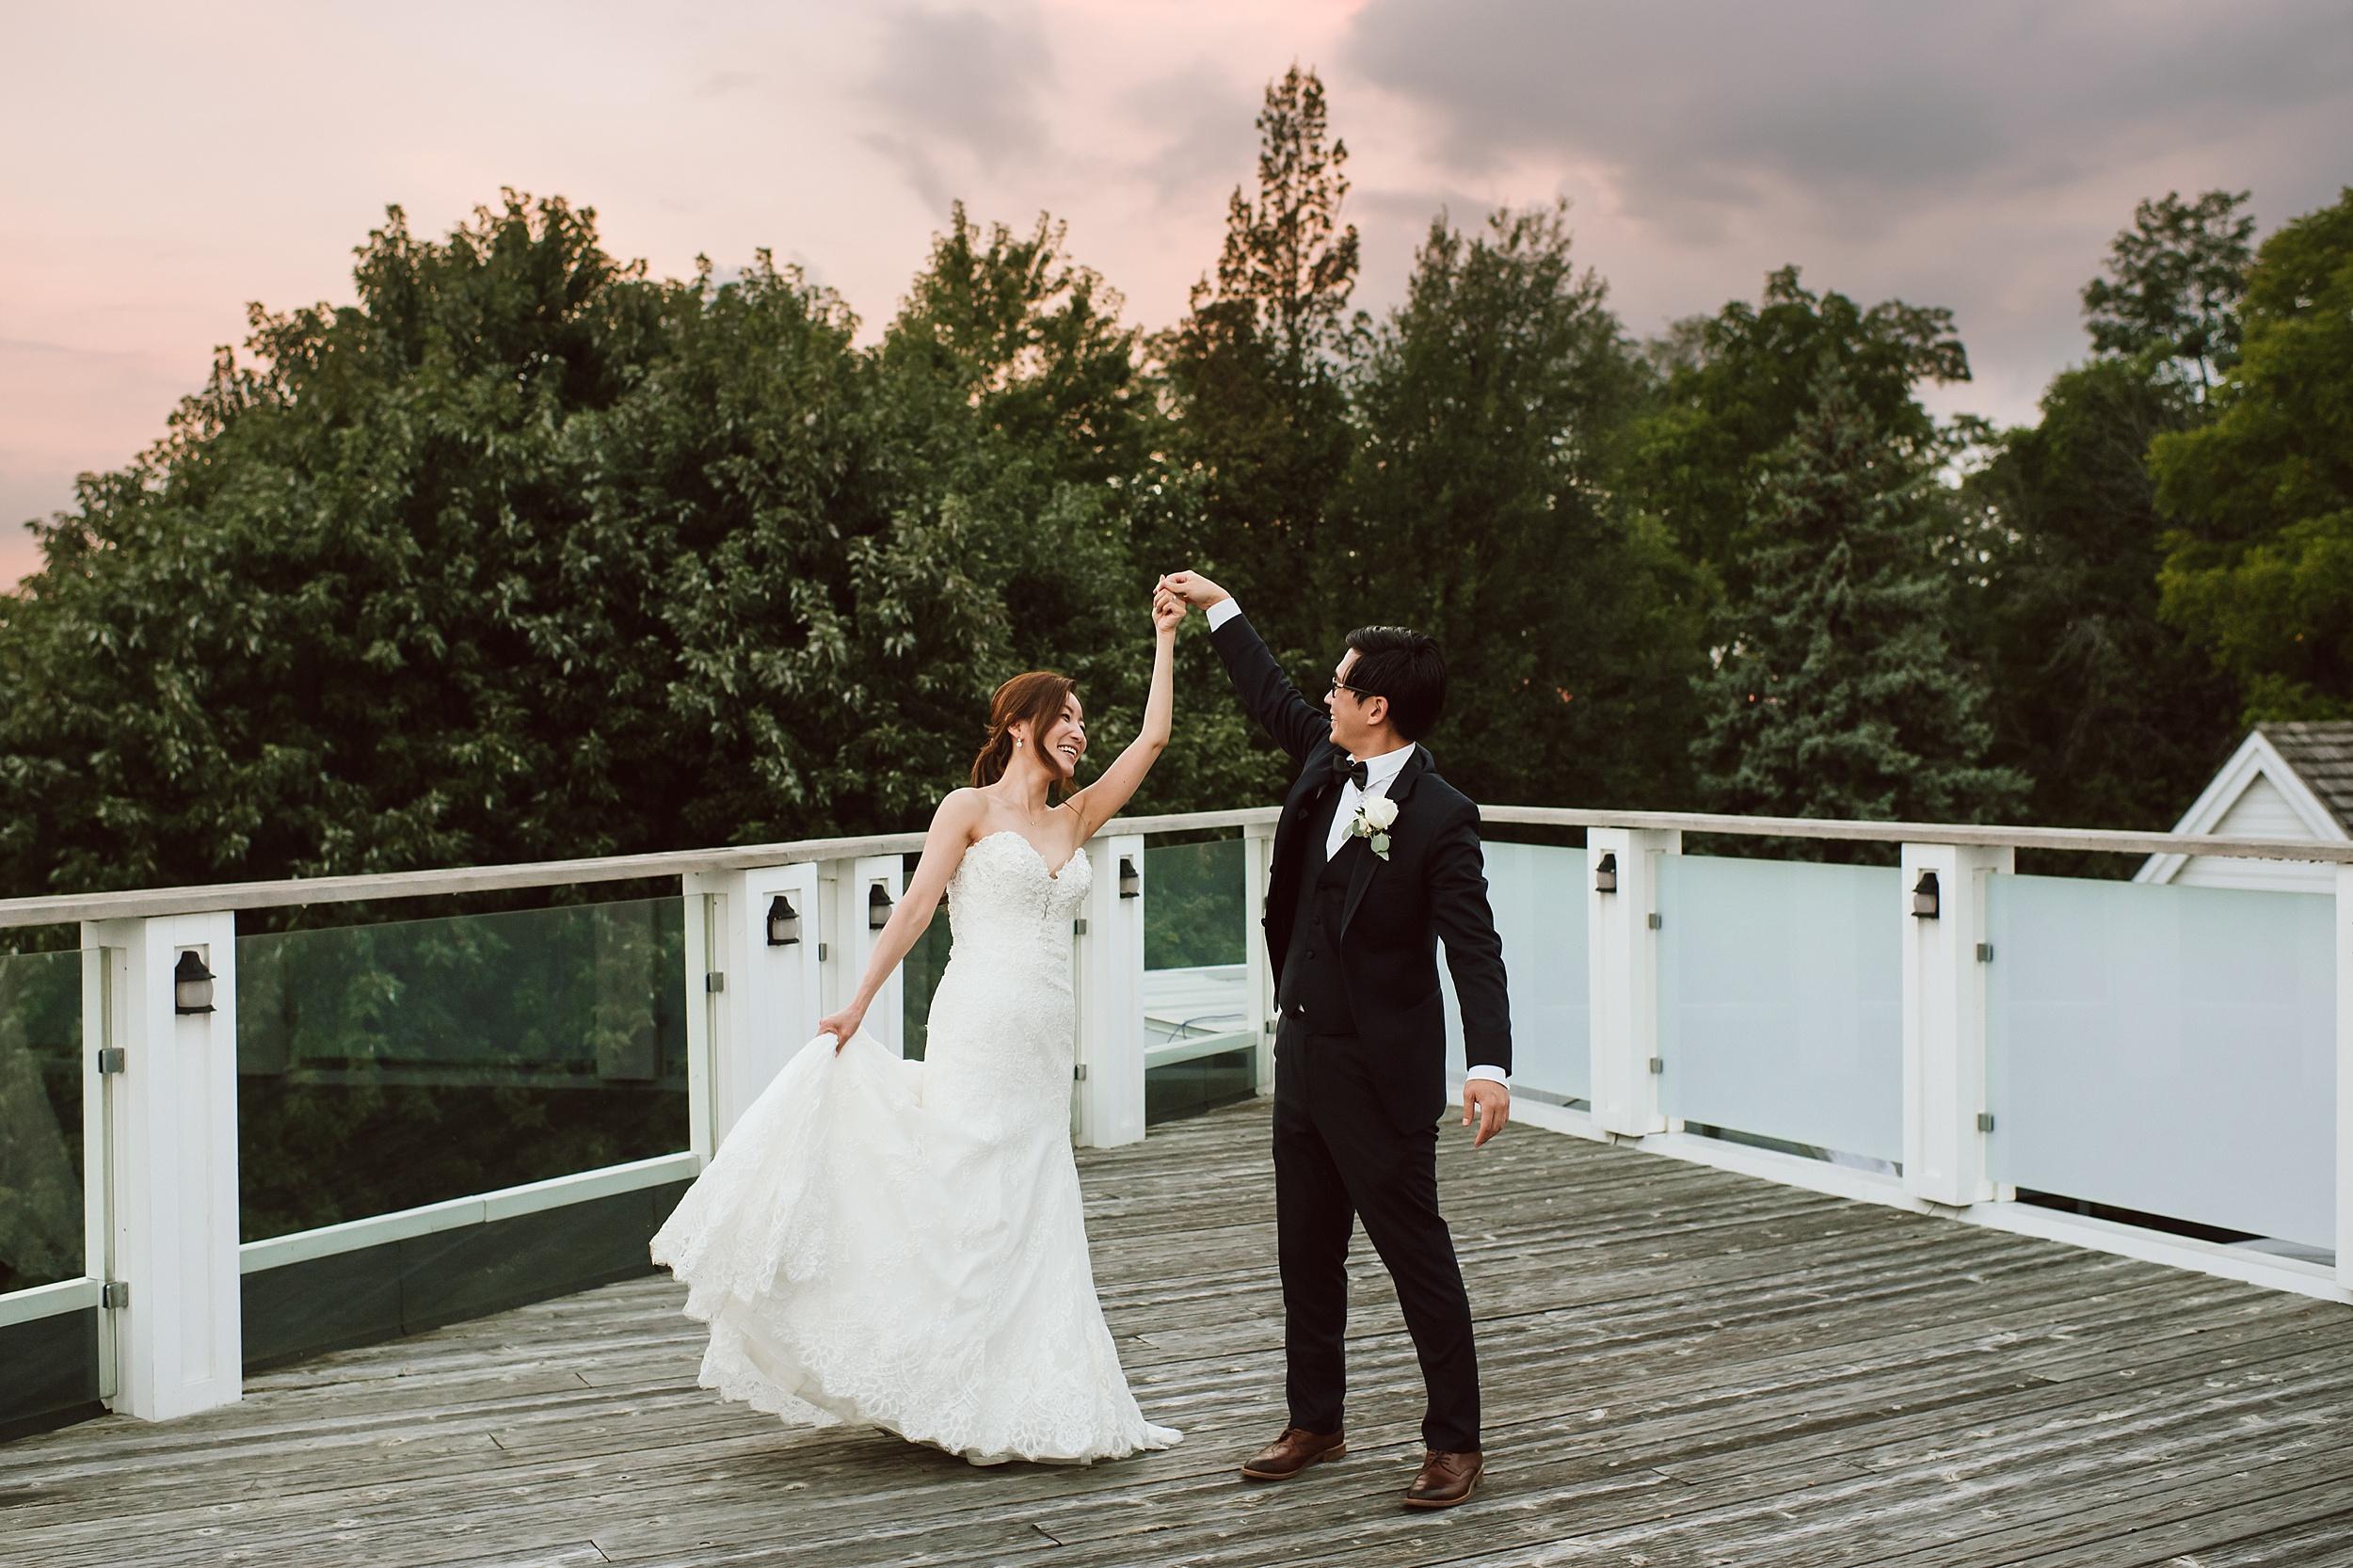 Doctors_House_Kleinburg_Wedding_Toronto_Photographer_0056.jpg